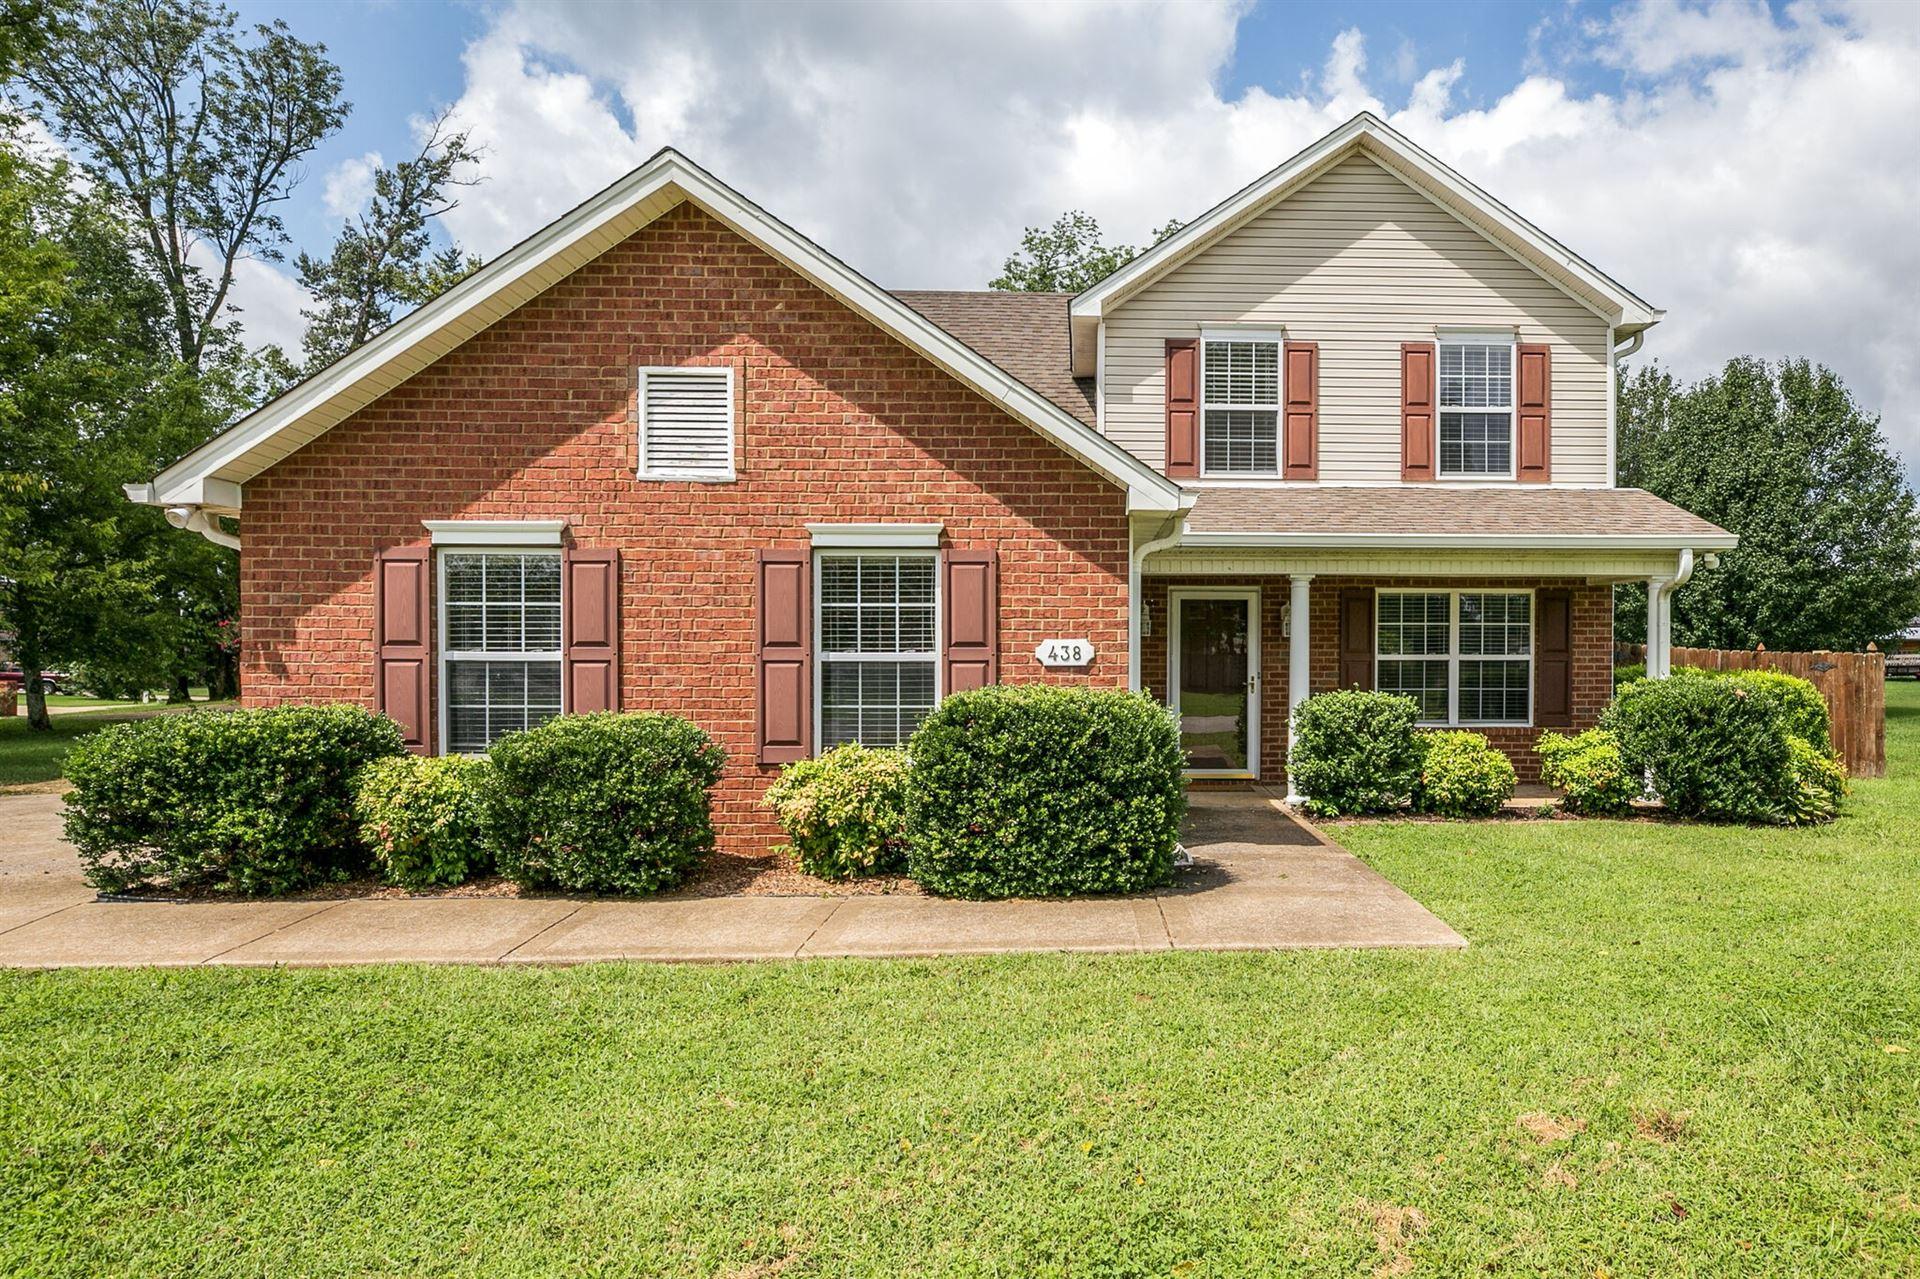 438 Conhocken Ct, Murfreesboro, TN 37128 - MLS#: 2178137